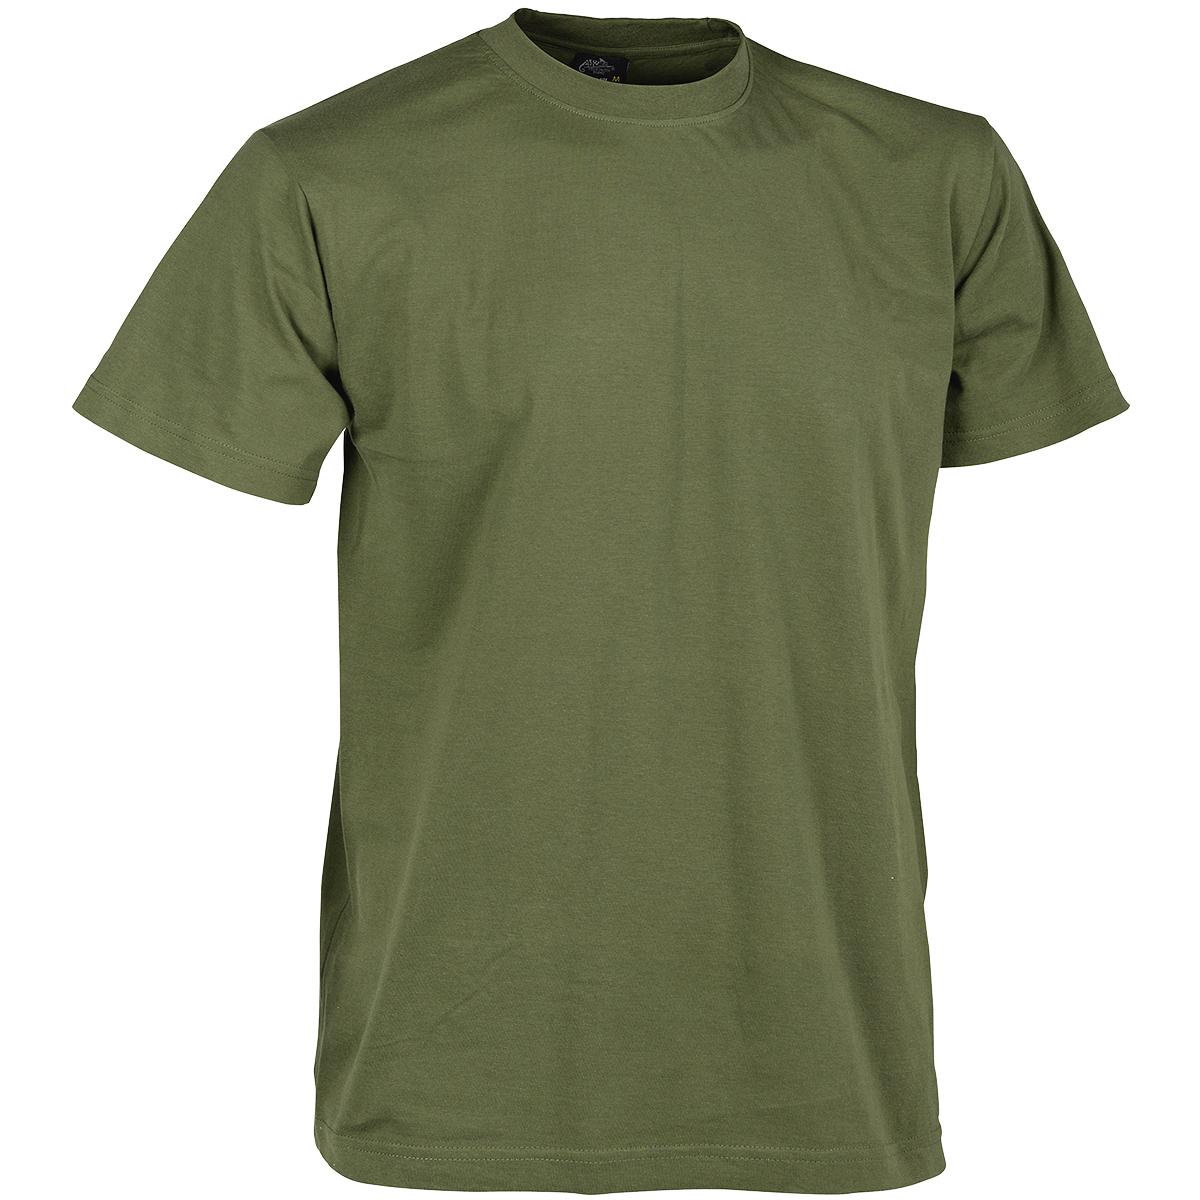 Helikon army patrol mens t shirt military work wear top for Green mens t shirt